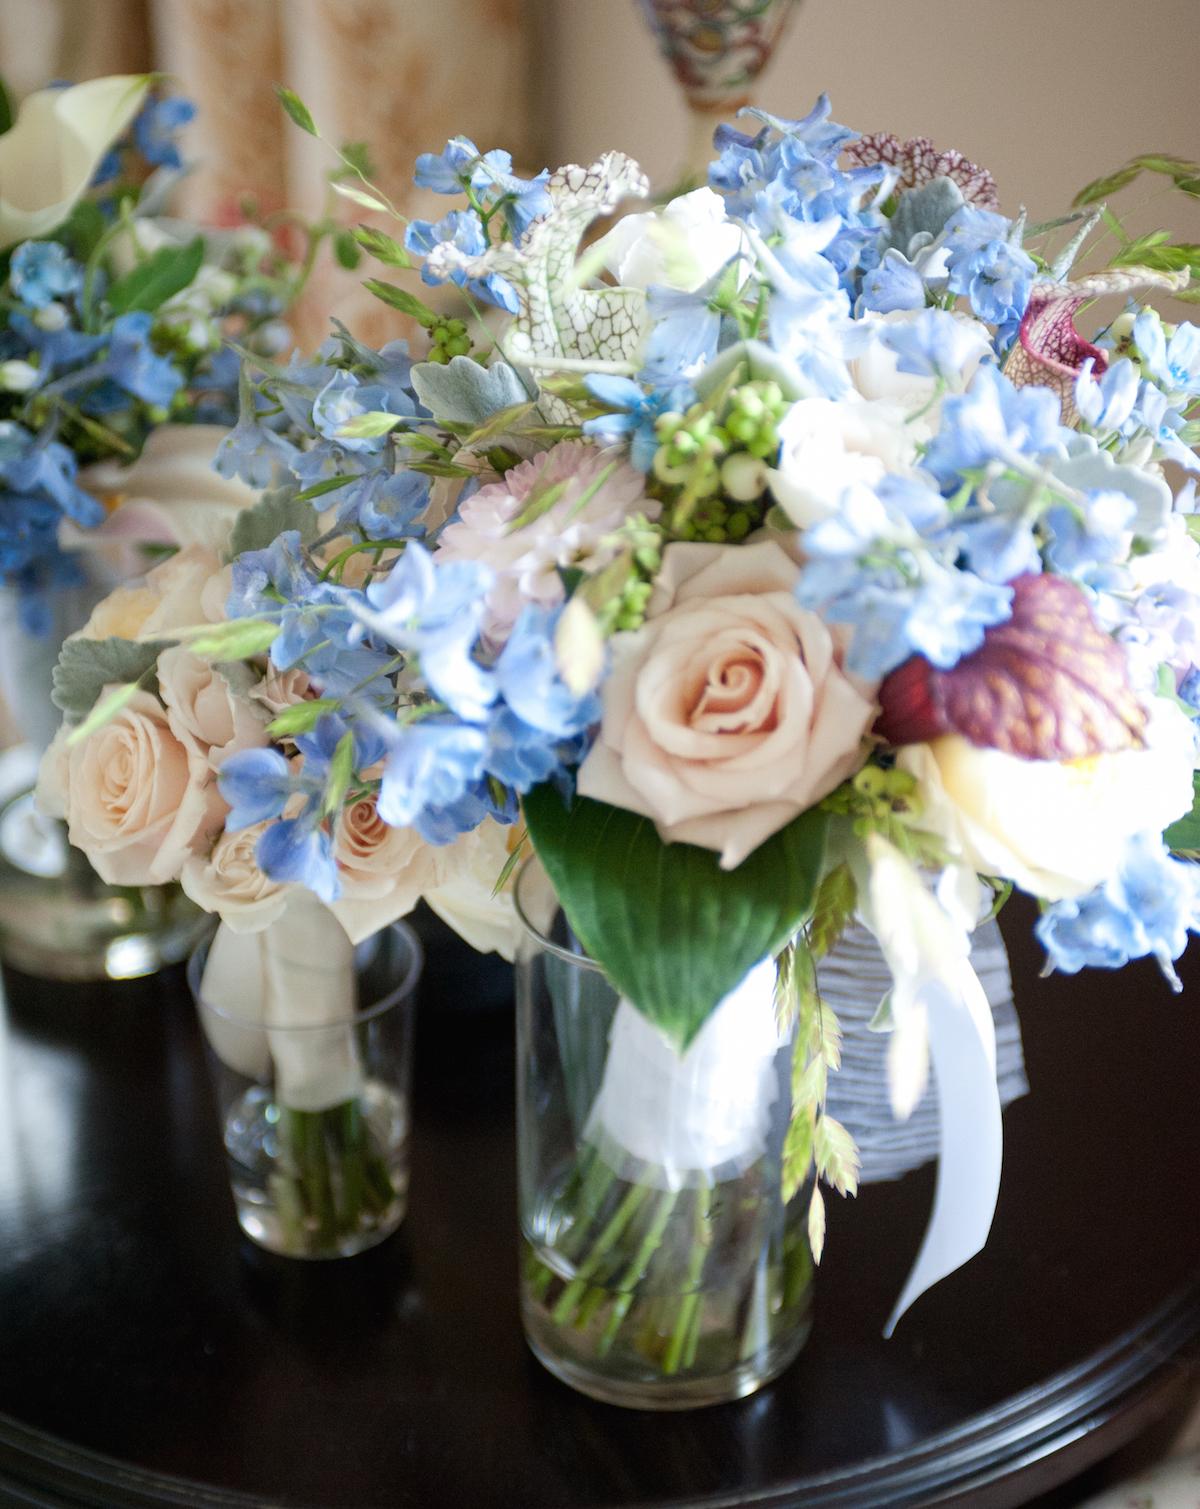 This garden style bouquet features blush roses, hosta, sarracenia, sea oats, delphinium, sahara roses and symphoricarpos berries; Photo courtesy of Winston Flowers